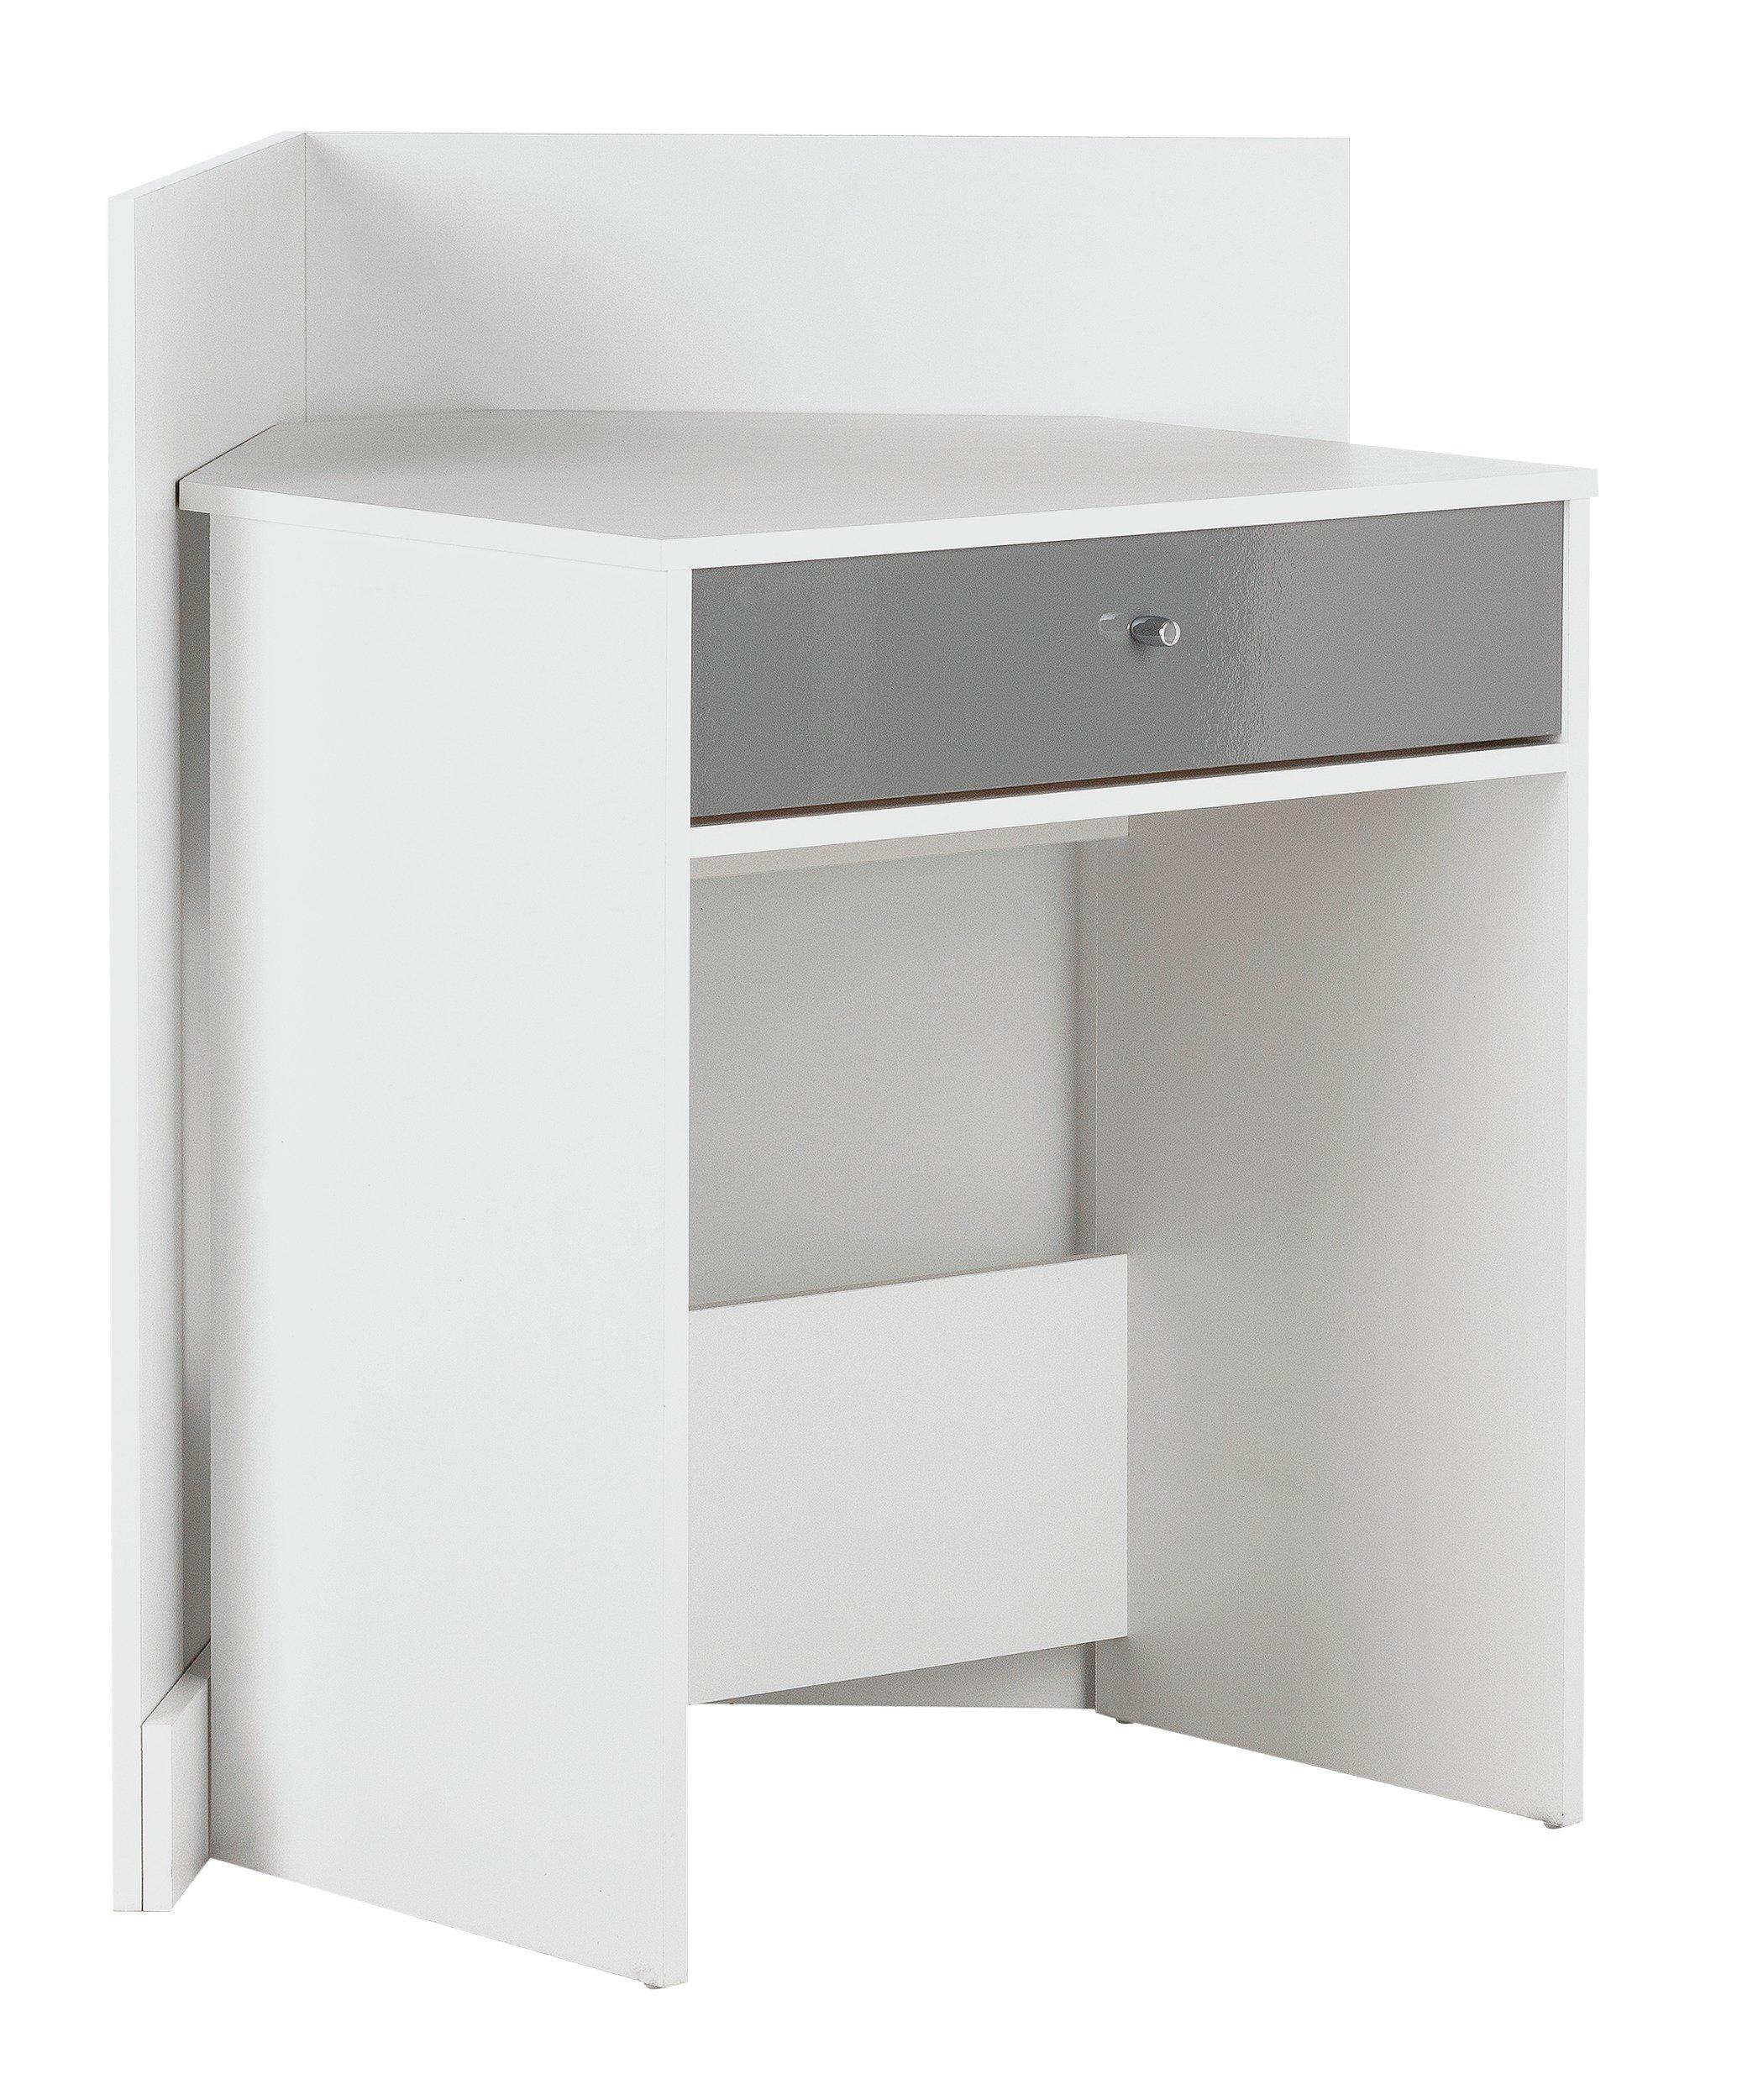 sale on home gloss front compact corner desk white. Black Bedroom Furniture Sets. Home Design Ideas